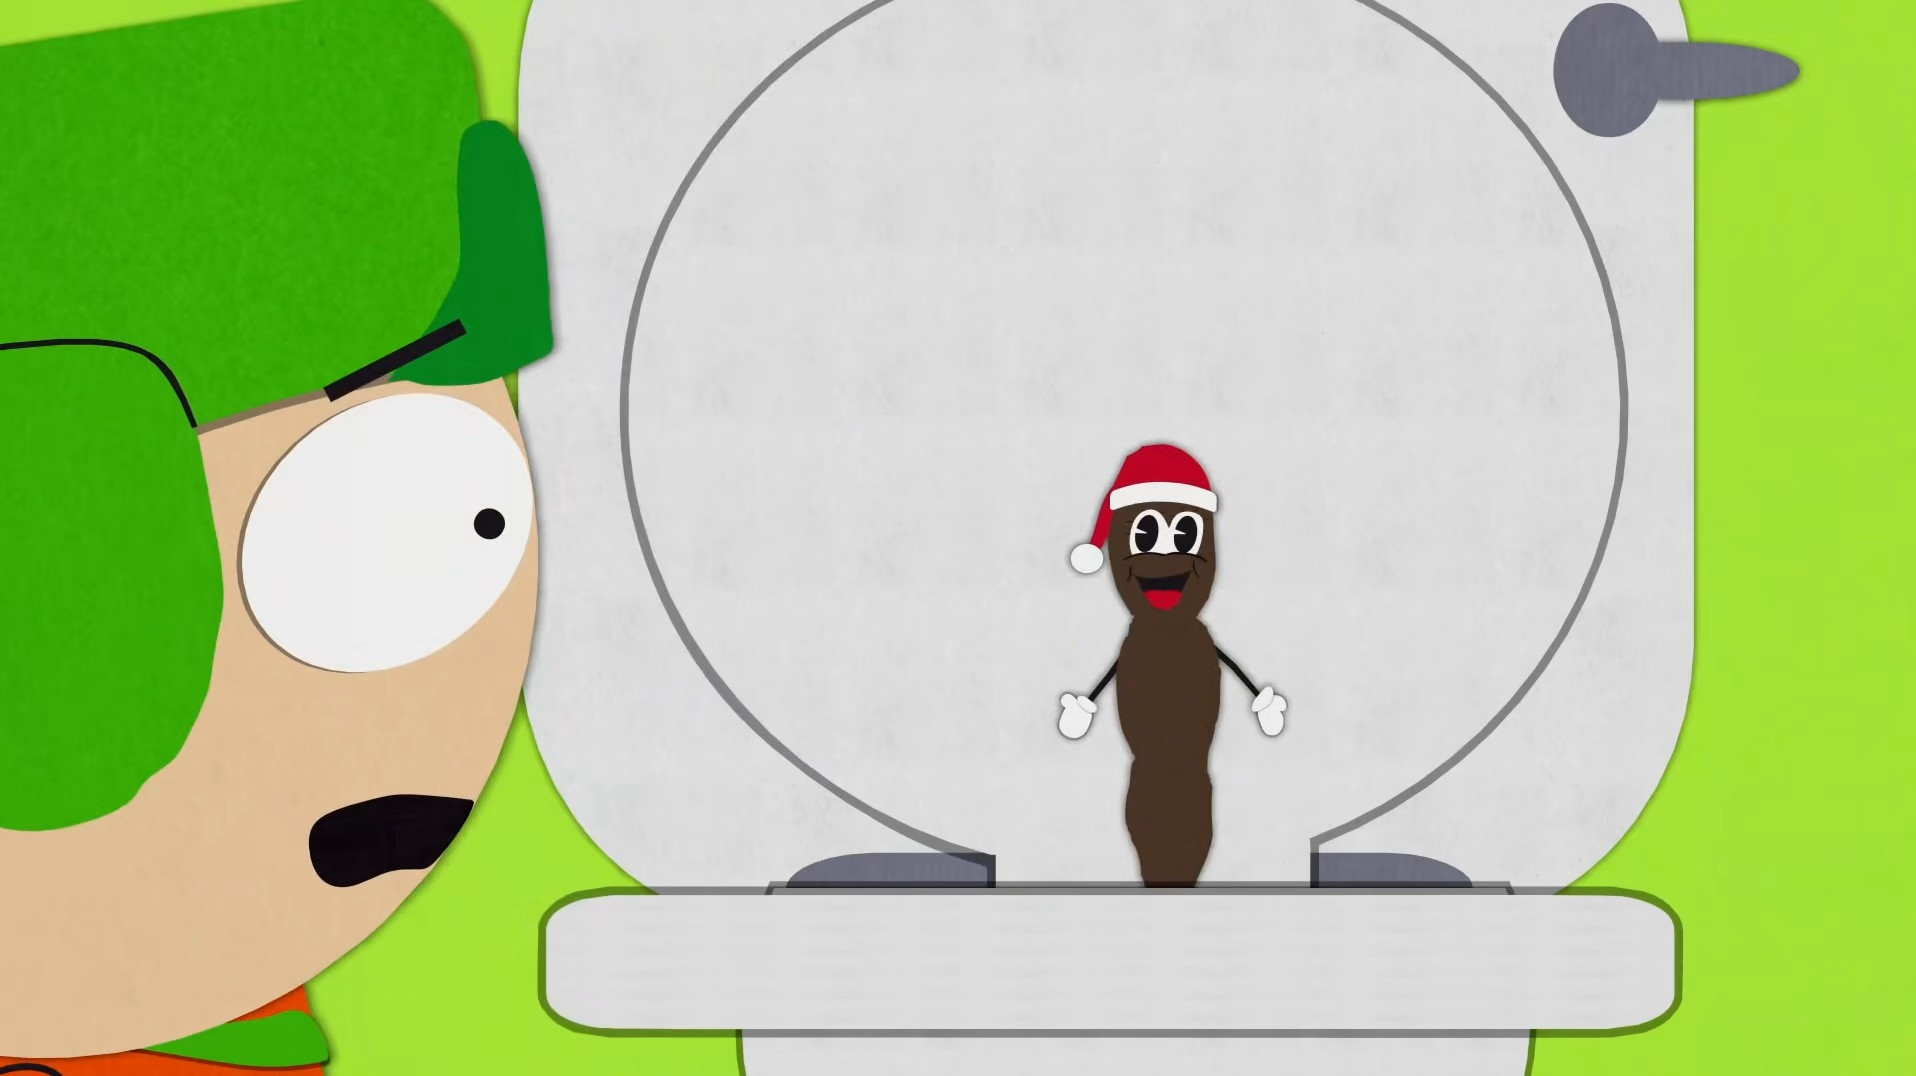 Hankey The Christmas Poo.South Park Mr Hankey The Christmas Poo Tv Episode 1997